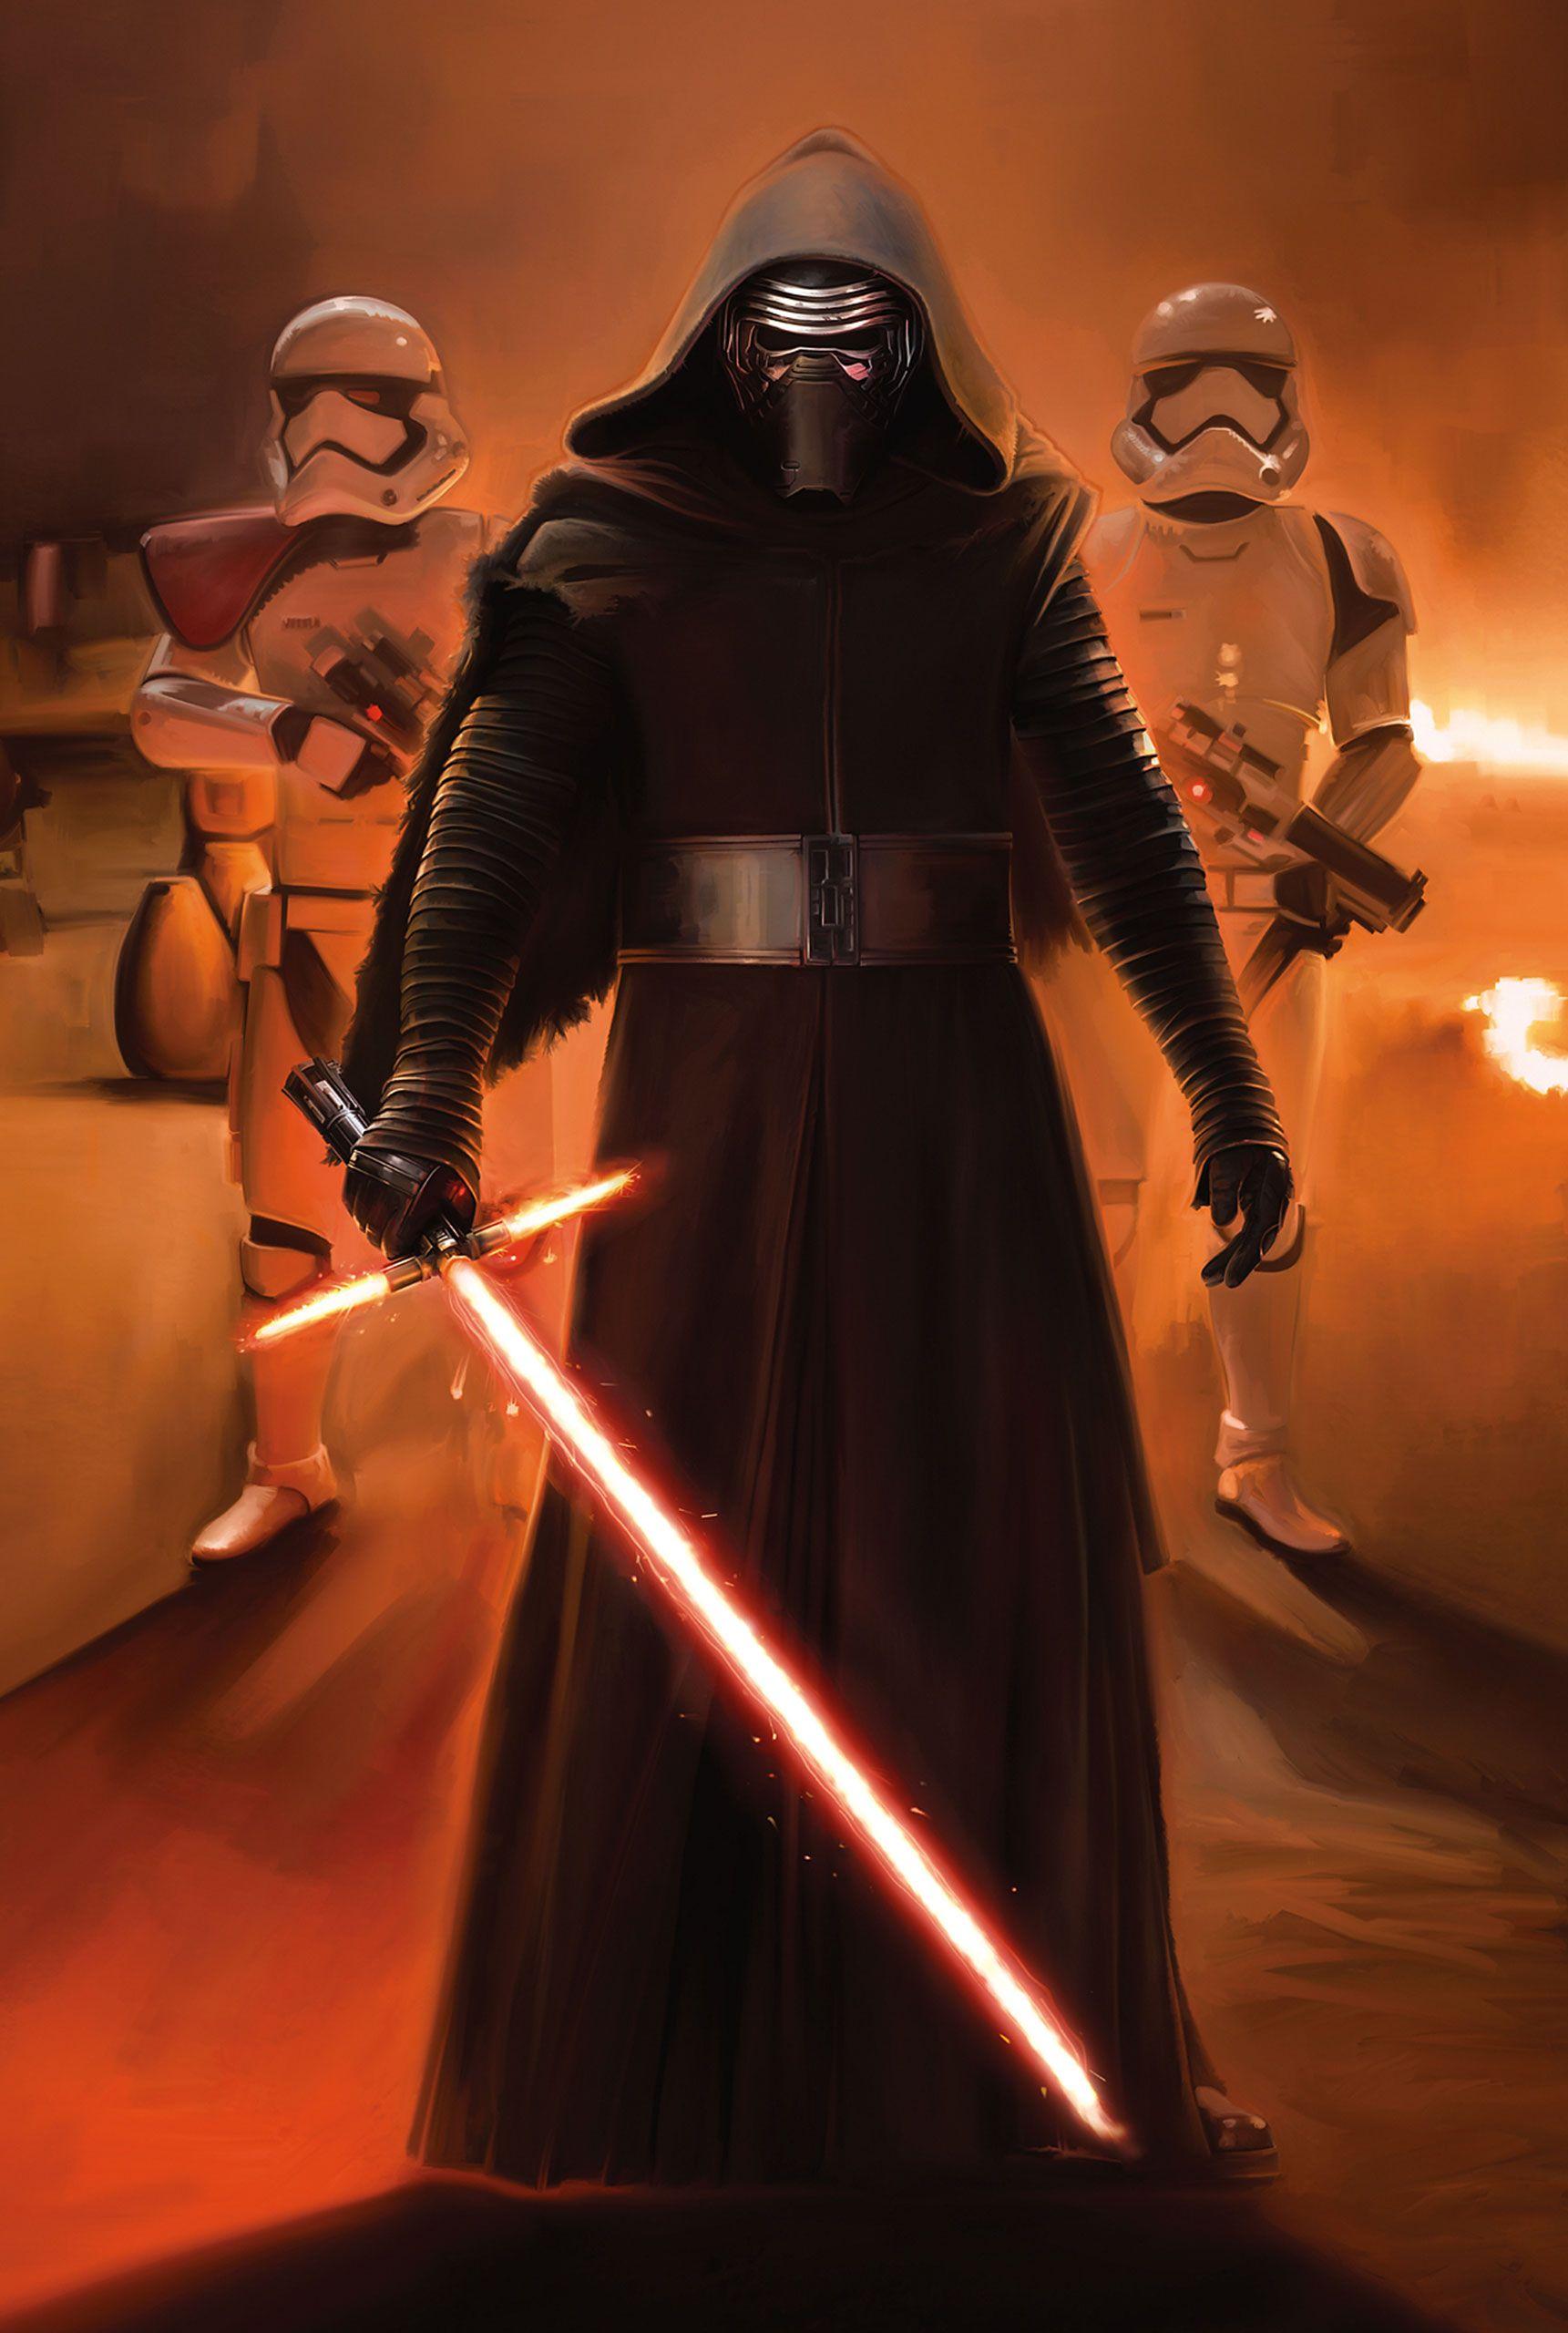 Star Wars Episode Vll the Force Awakens Kylo Ren